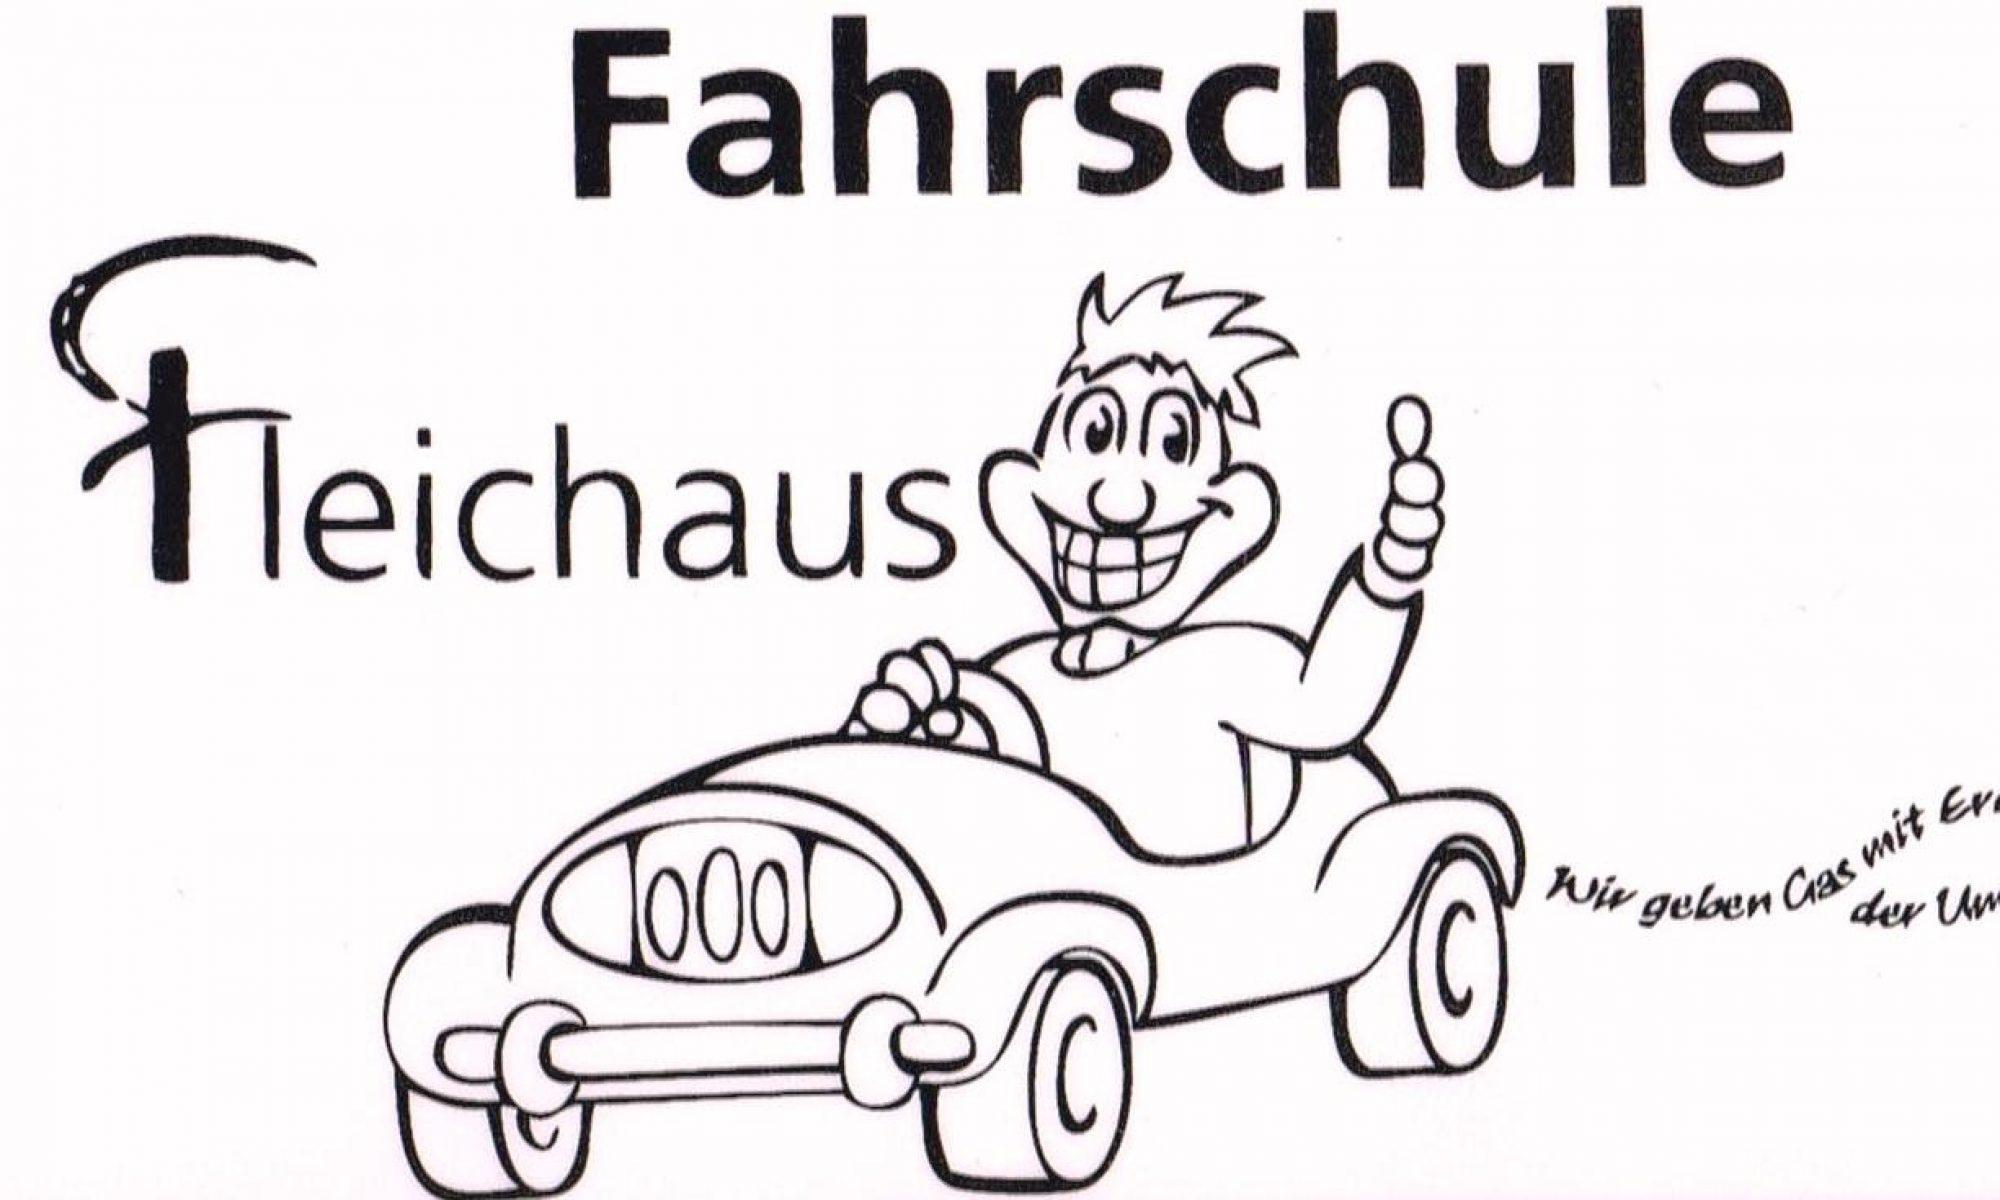 Fahrschule Fleichaus